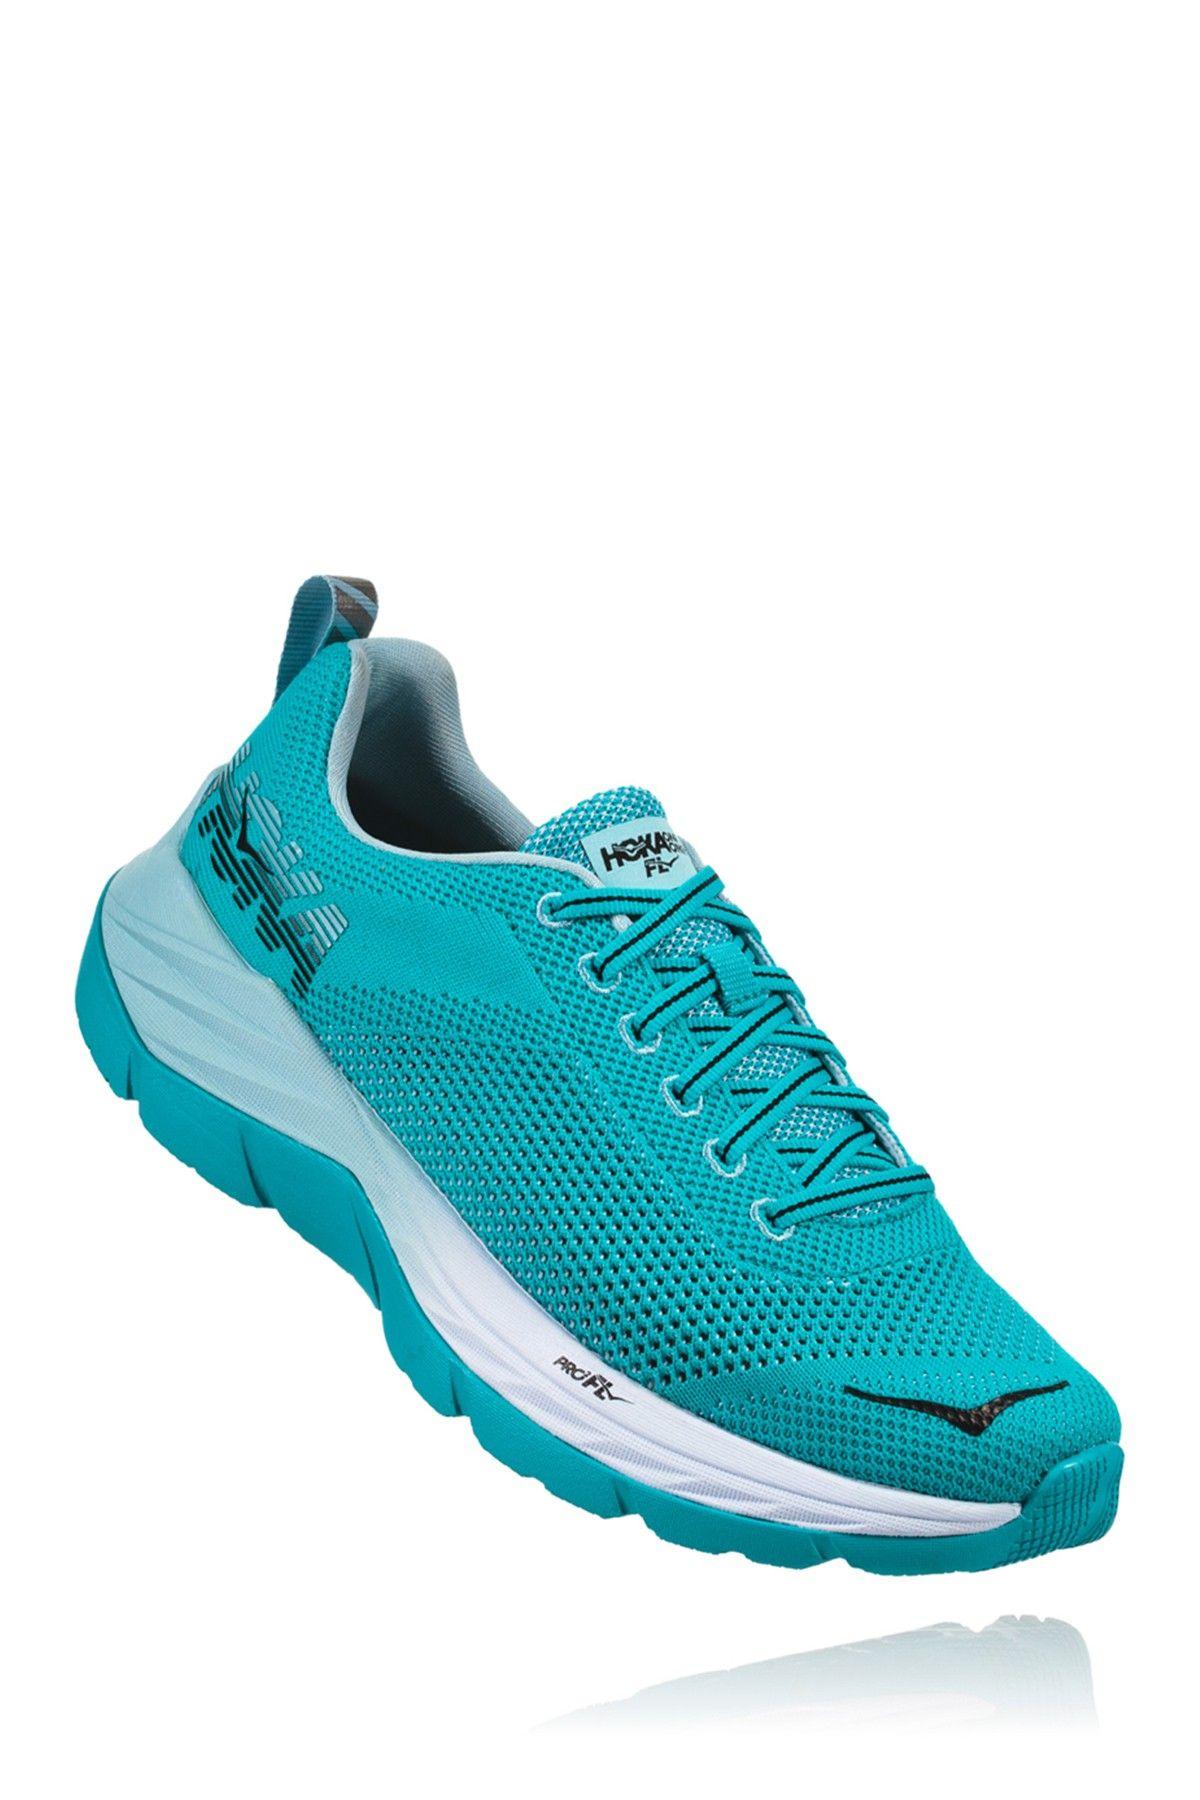 Hoka One One Mach Running Shoe In Bdwh